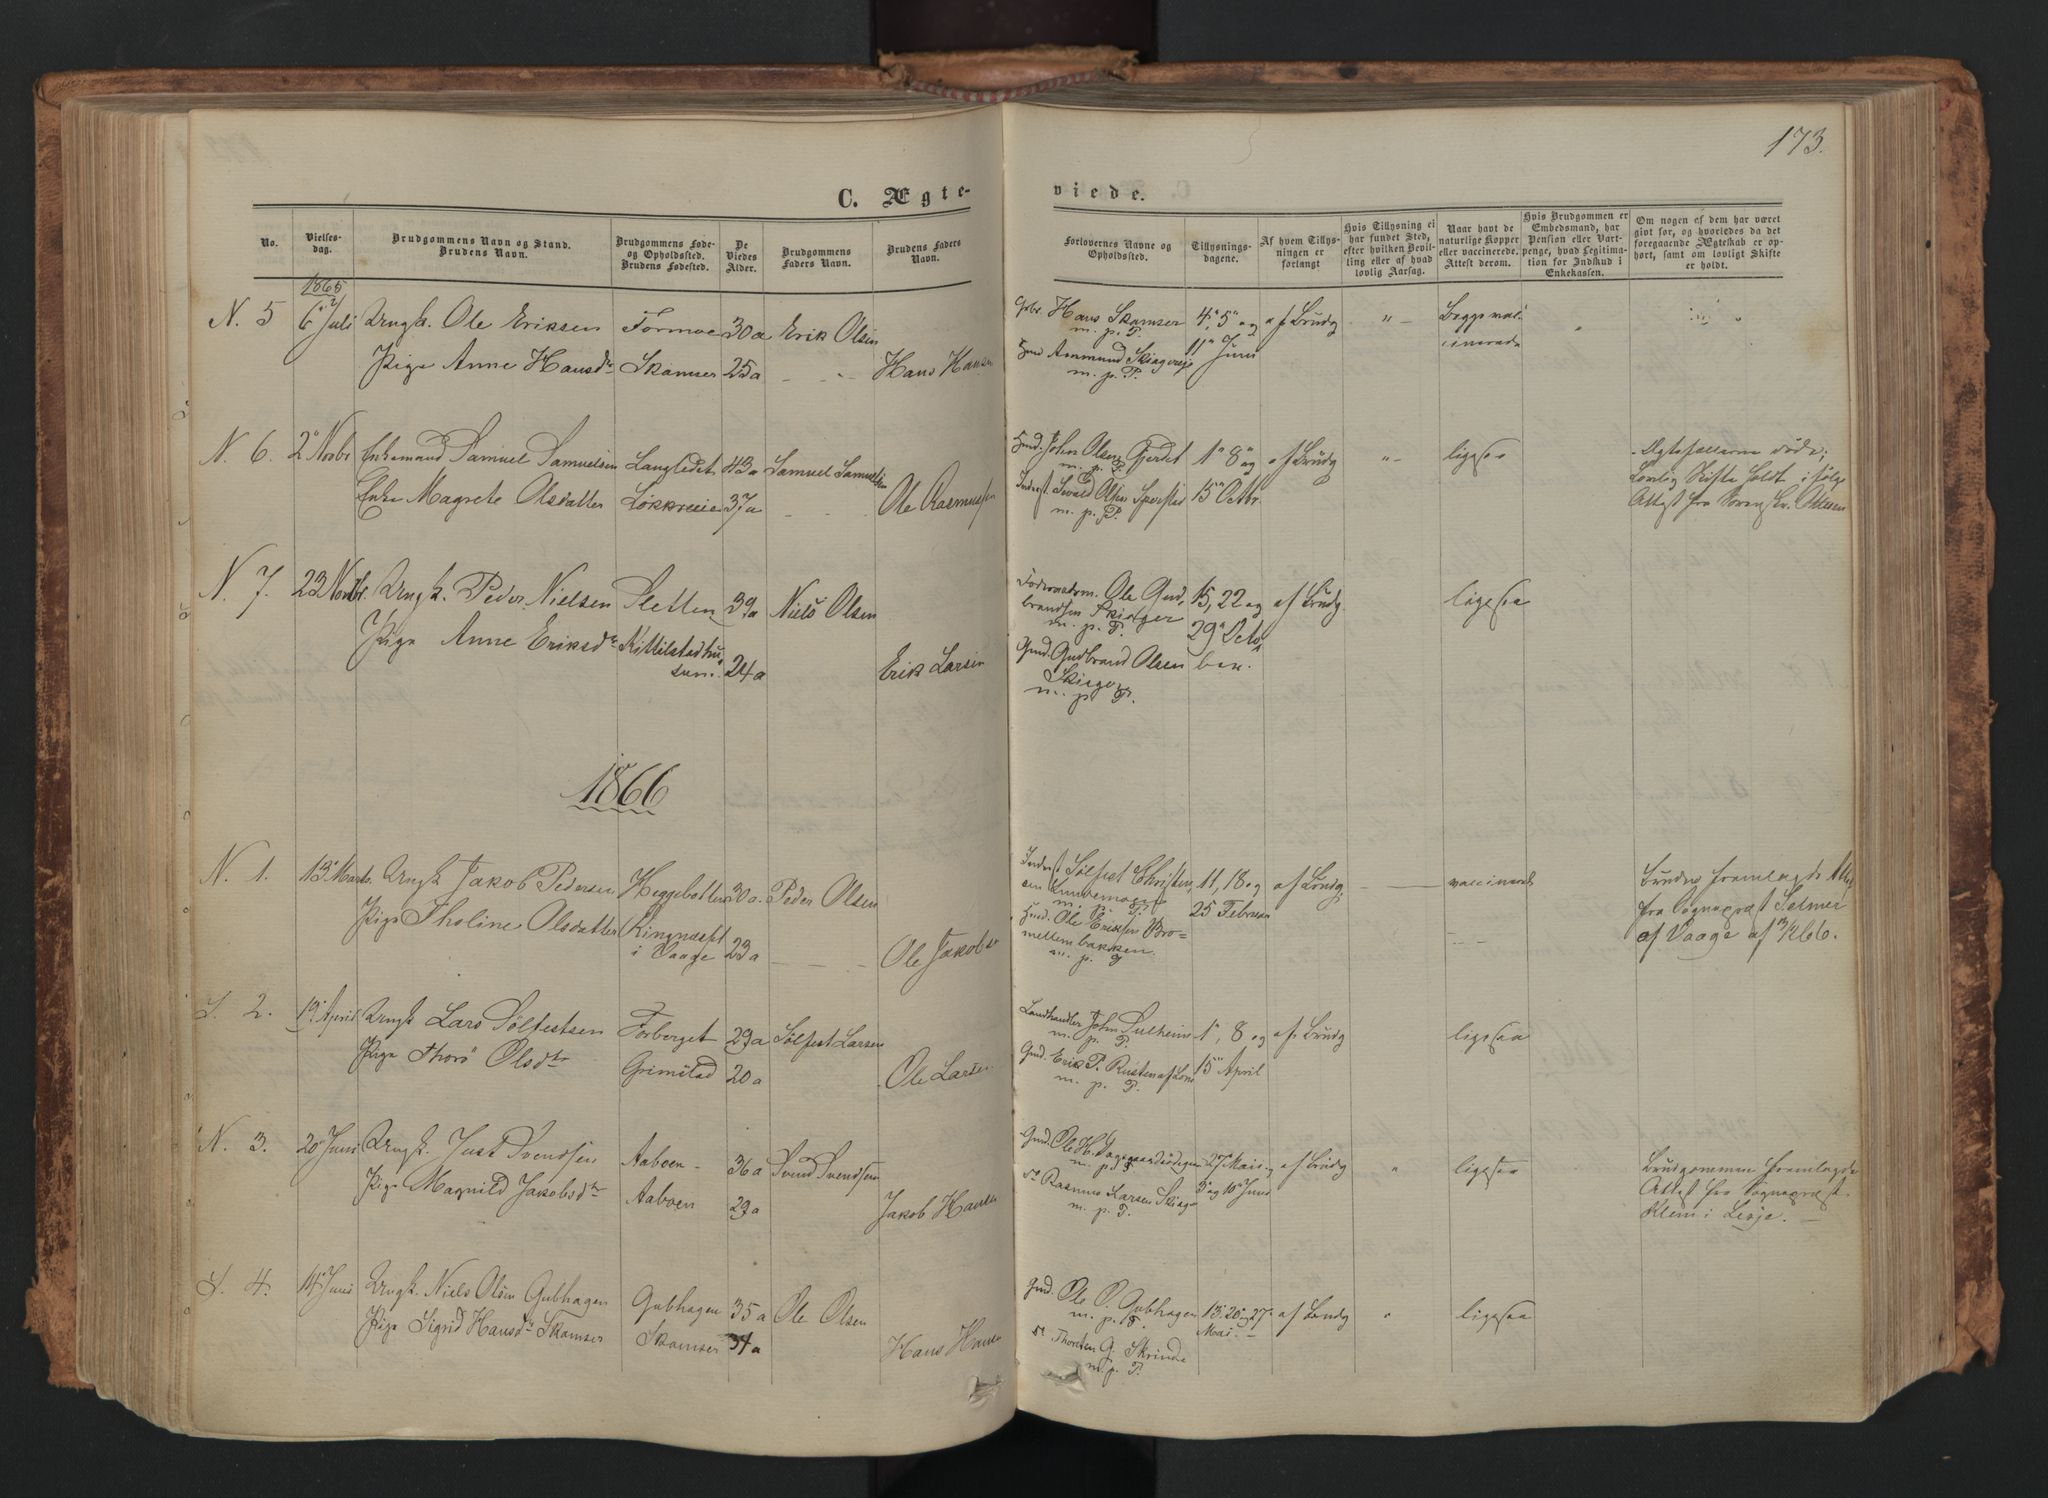 SAH, Skjåk prestekontor, Ministerialbok nr. 1, 1863-1879, s. 173